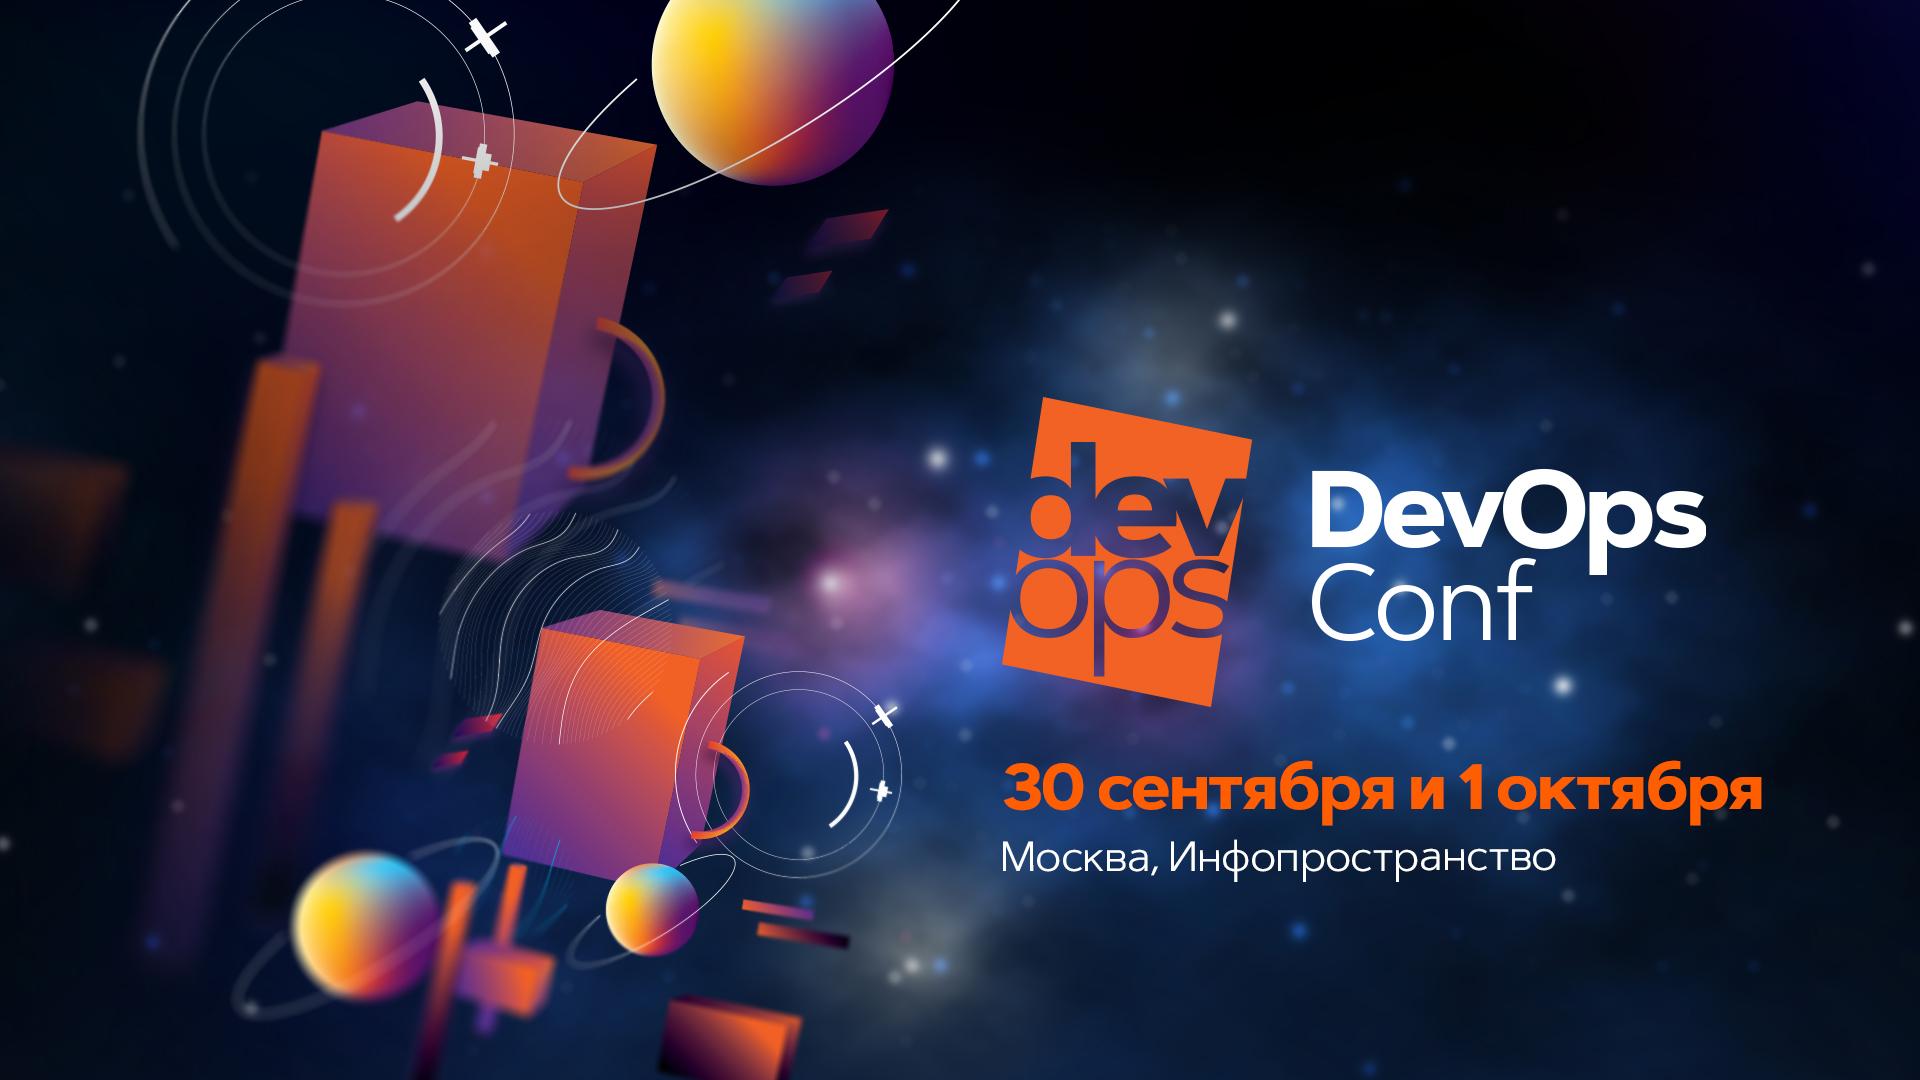 Путеводитель по галактике DevOpsConf 2019